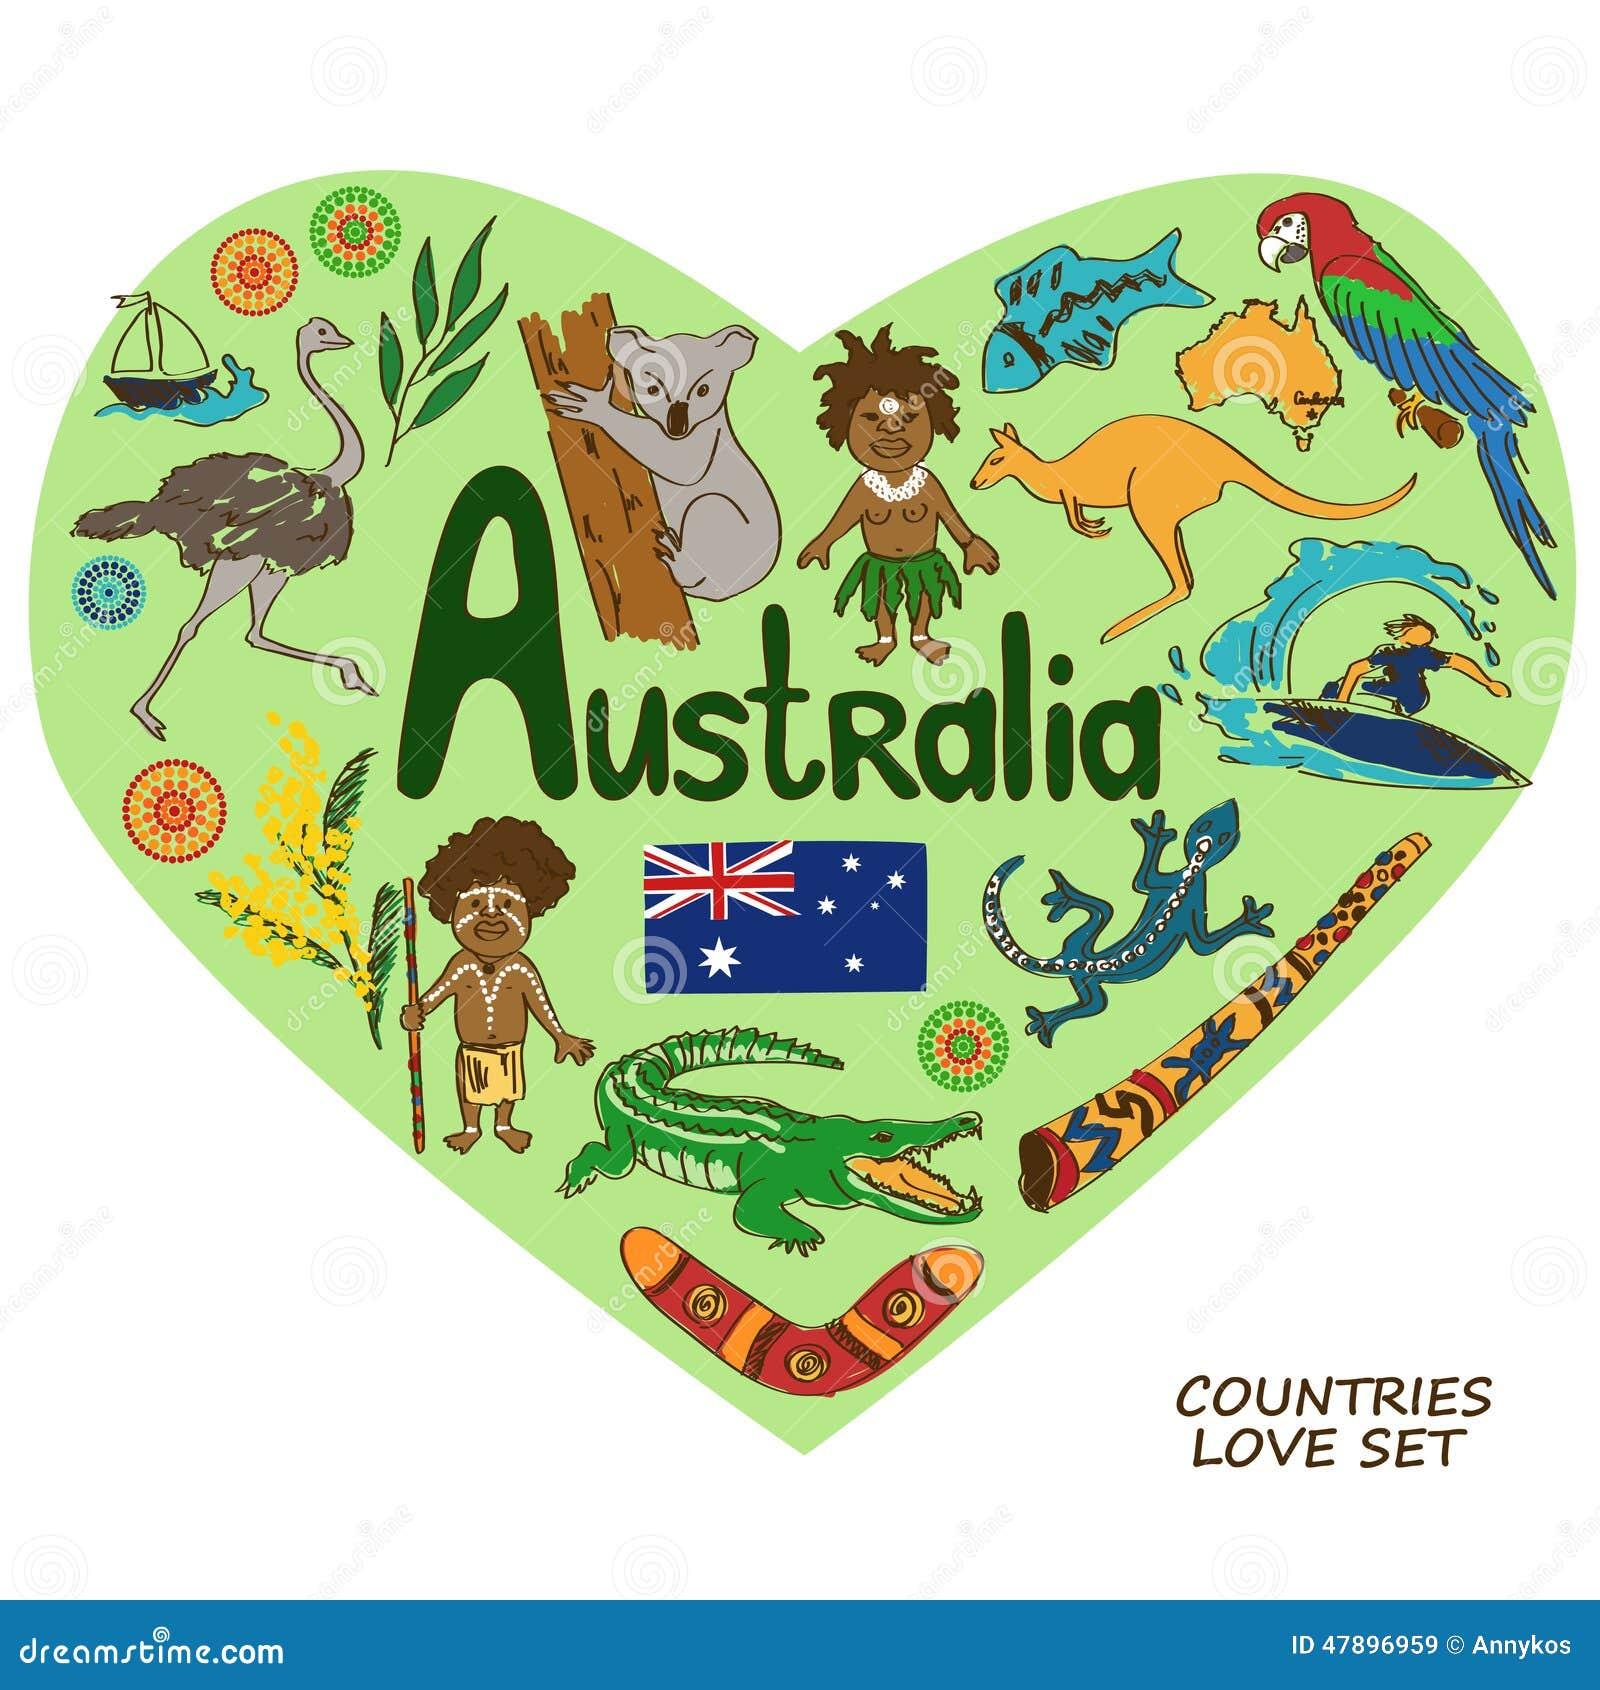 Australian symbols in heart shape concept stock vector australian symbols in heart shape concept buycottarizona Gallery